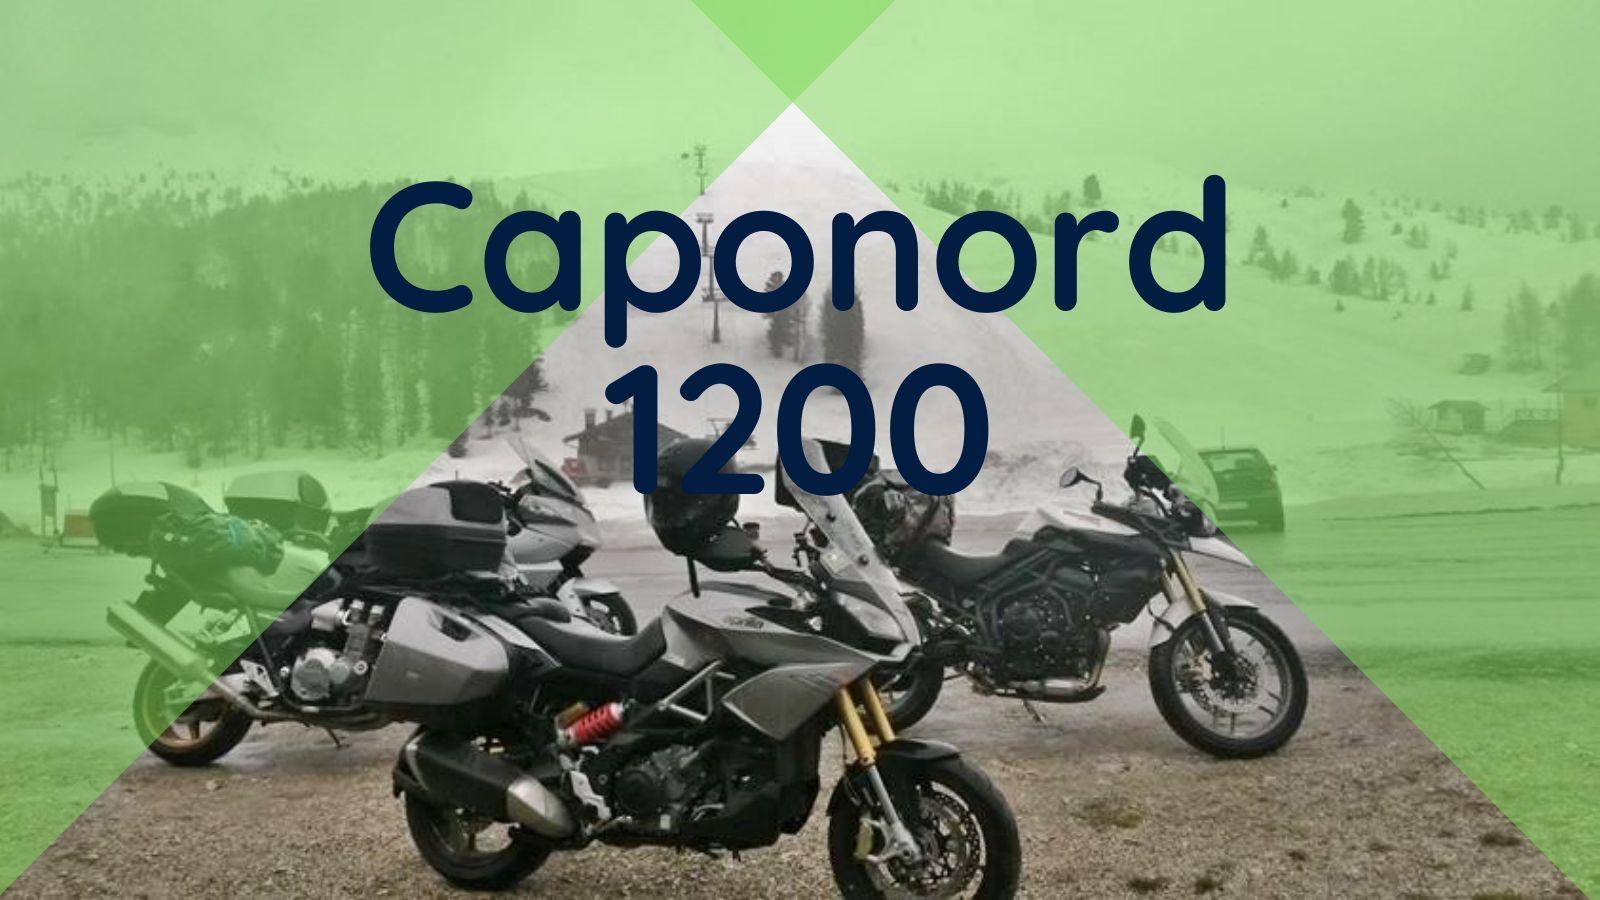 Caponord 1200 kapak görseli